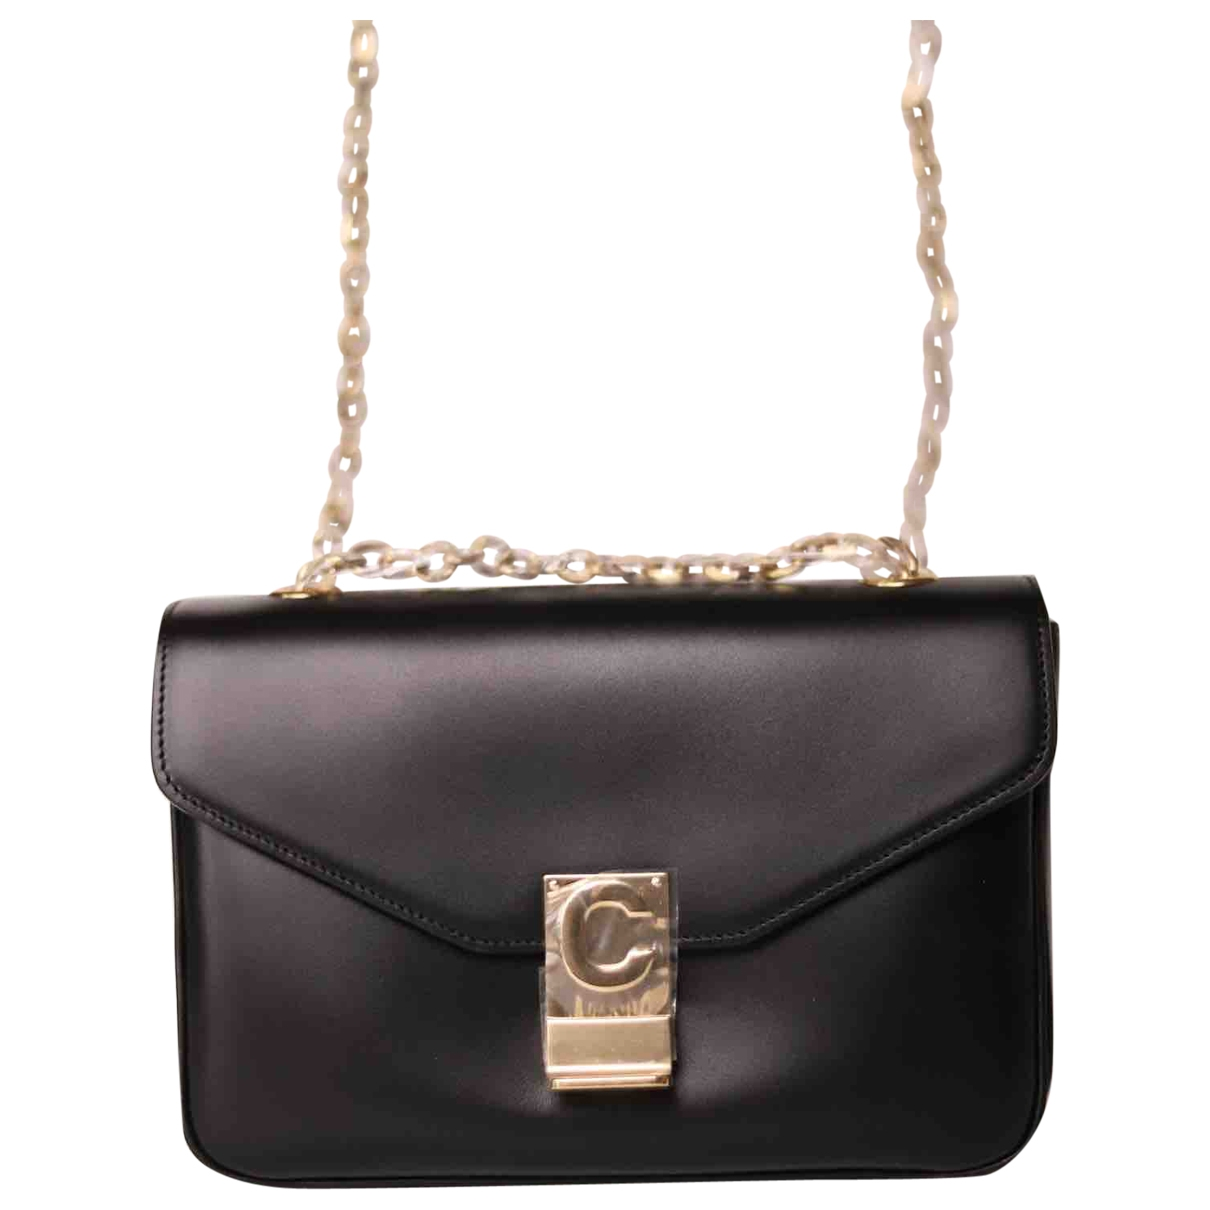 Celine C bag Black Leather handbag for Women \N